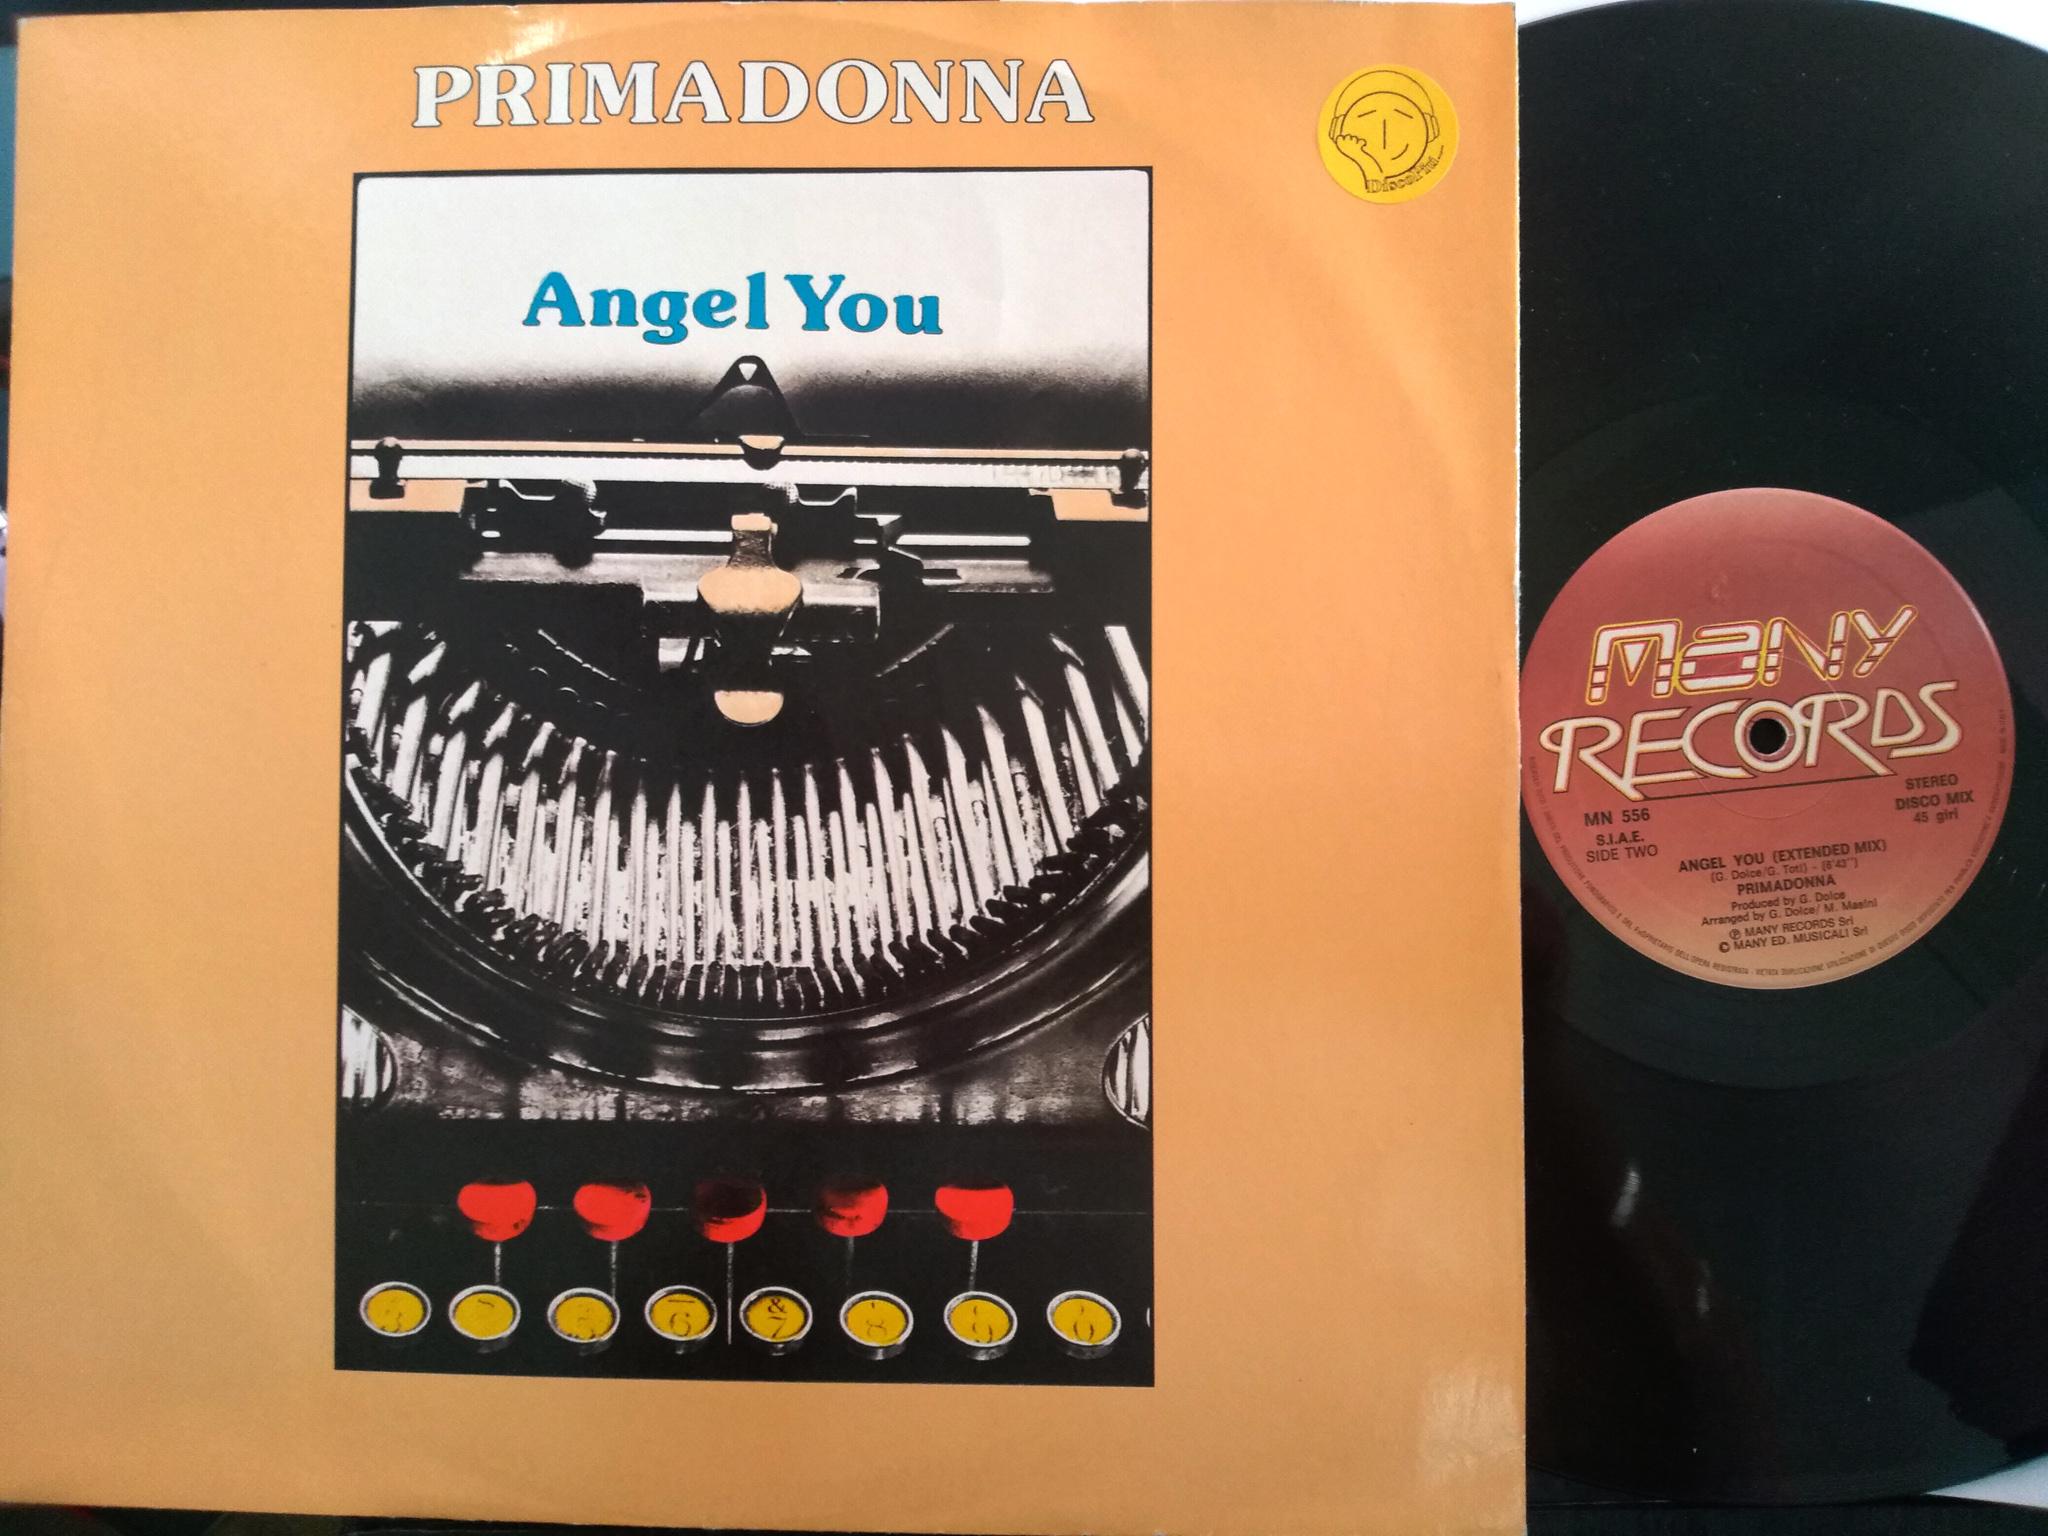 Primadonna - Angel You